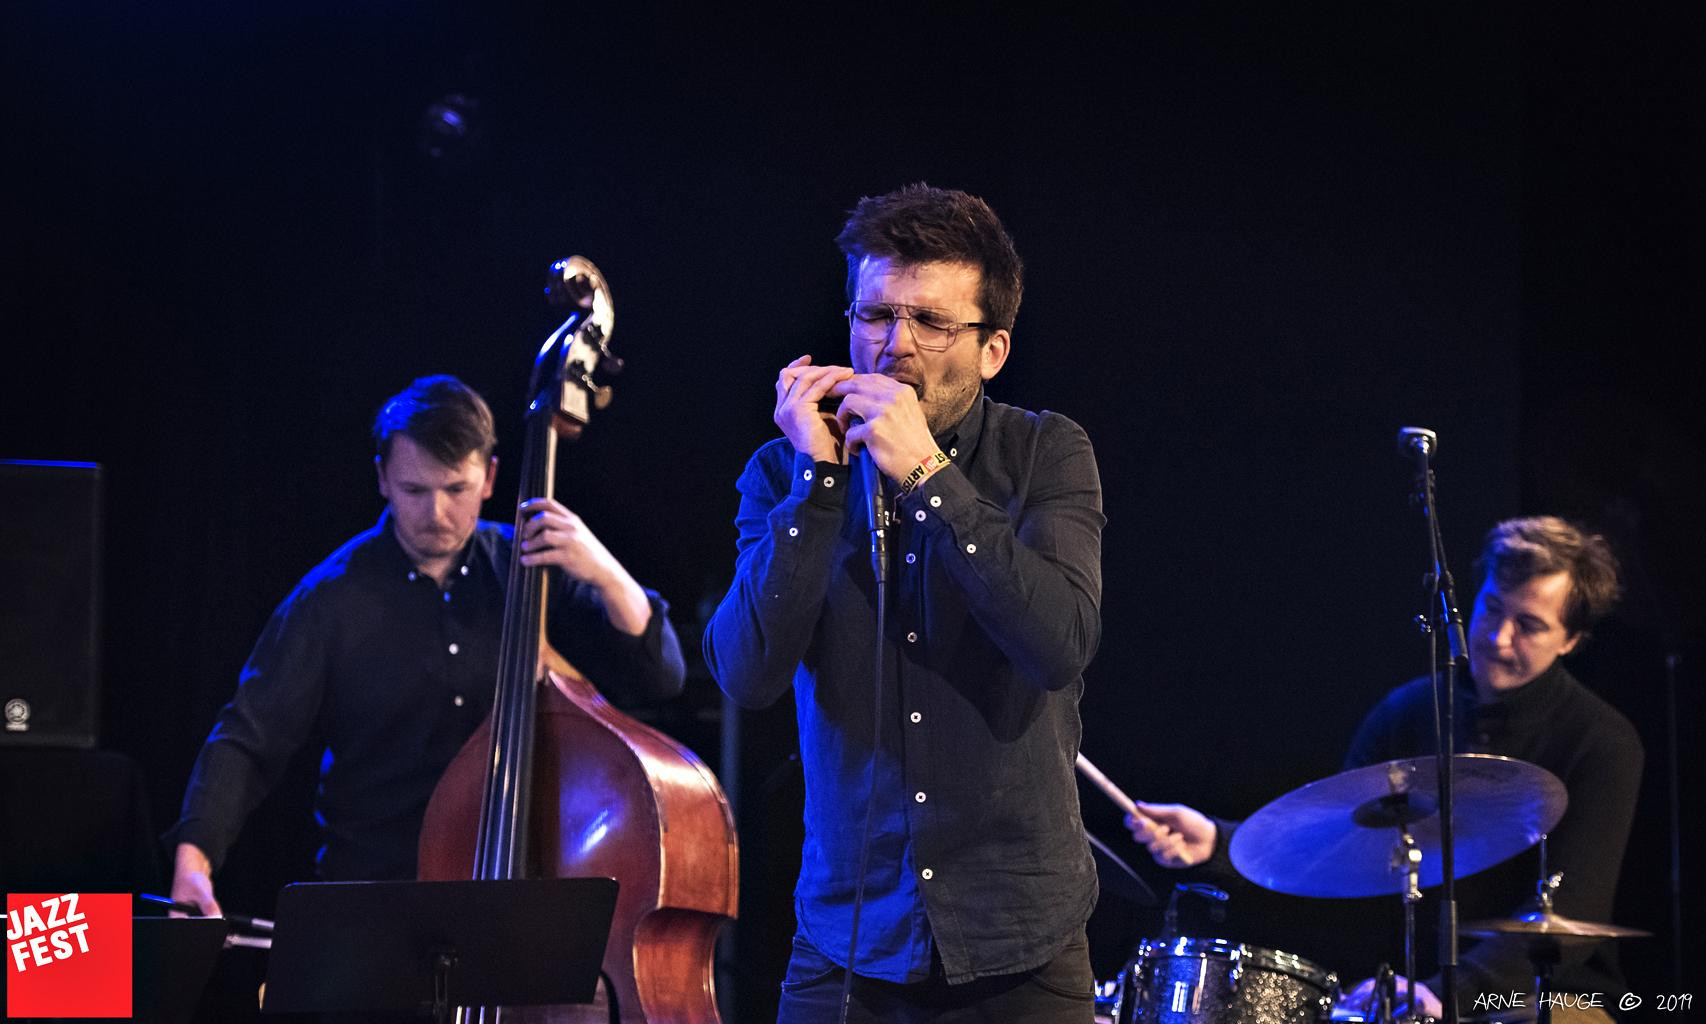 190510 Sondre Ferstad Ensemble (Jazz Expo) @ Dokkhuset - foto Arne Hauge_002.jpg